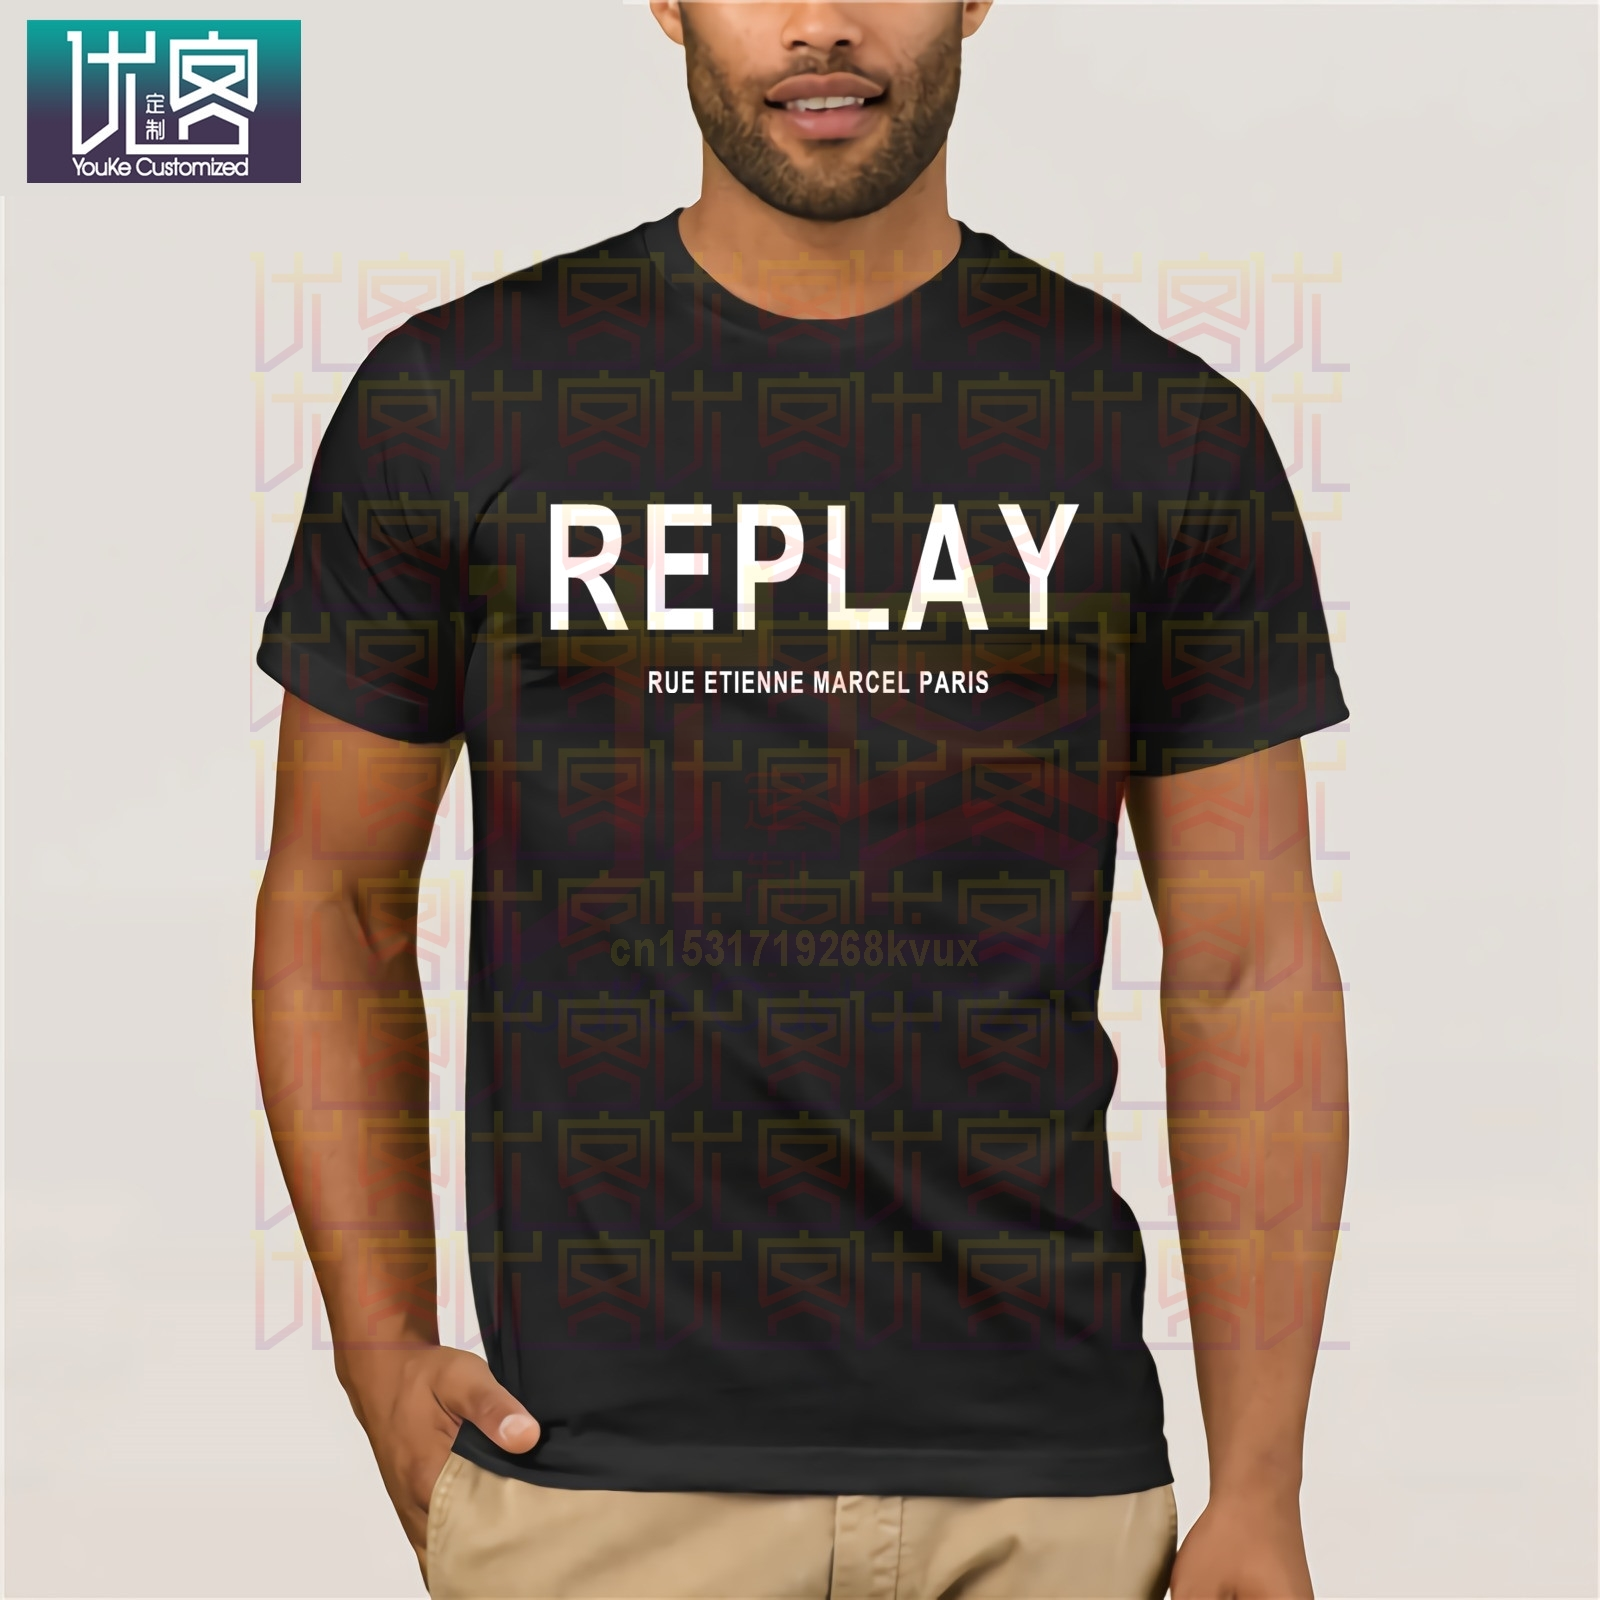 Song REPLAY- RUE ETIENNE MARCEL PARIS T-SHIRT Clothes Popular T-Shirt Crewneck Cotton Tees Tops Summer Tees Cotton T-Shirt